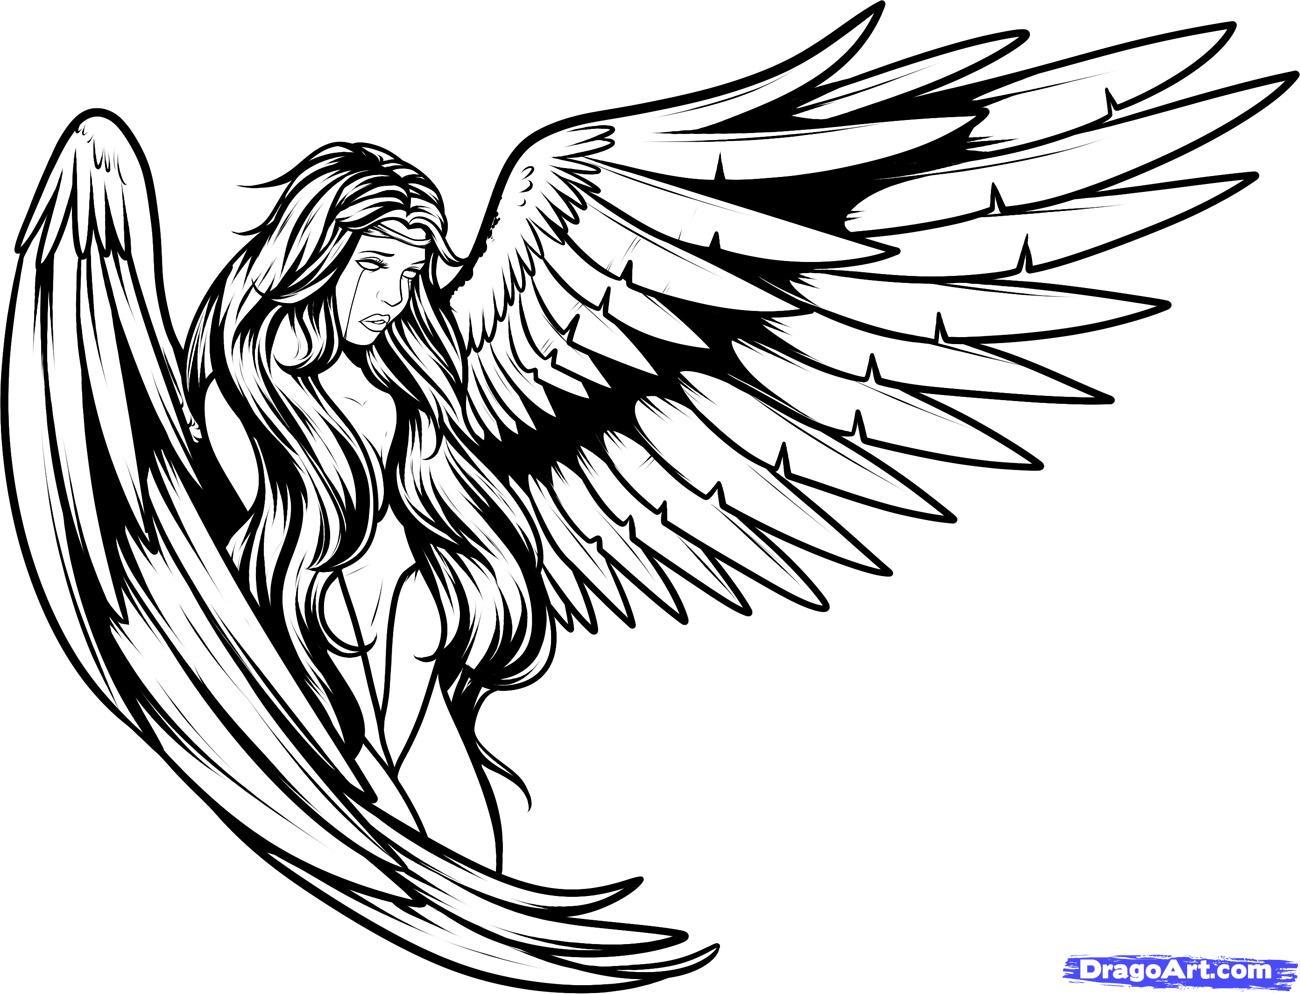 1300x994 Fallen Angel Clipart Outline